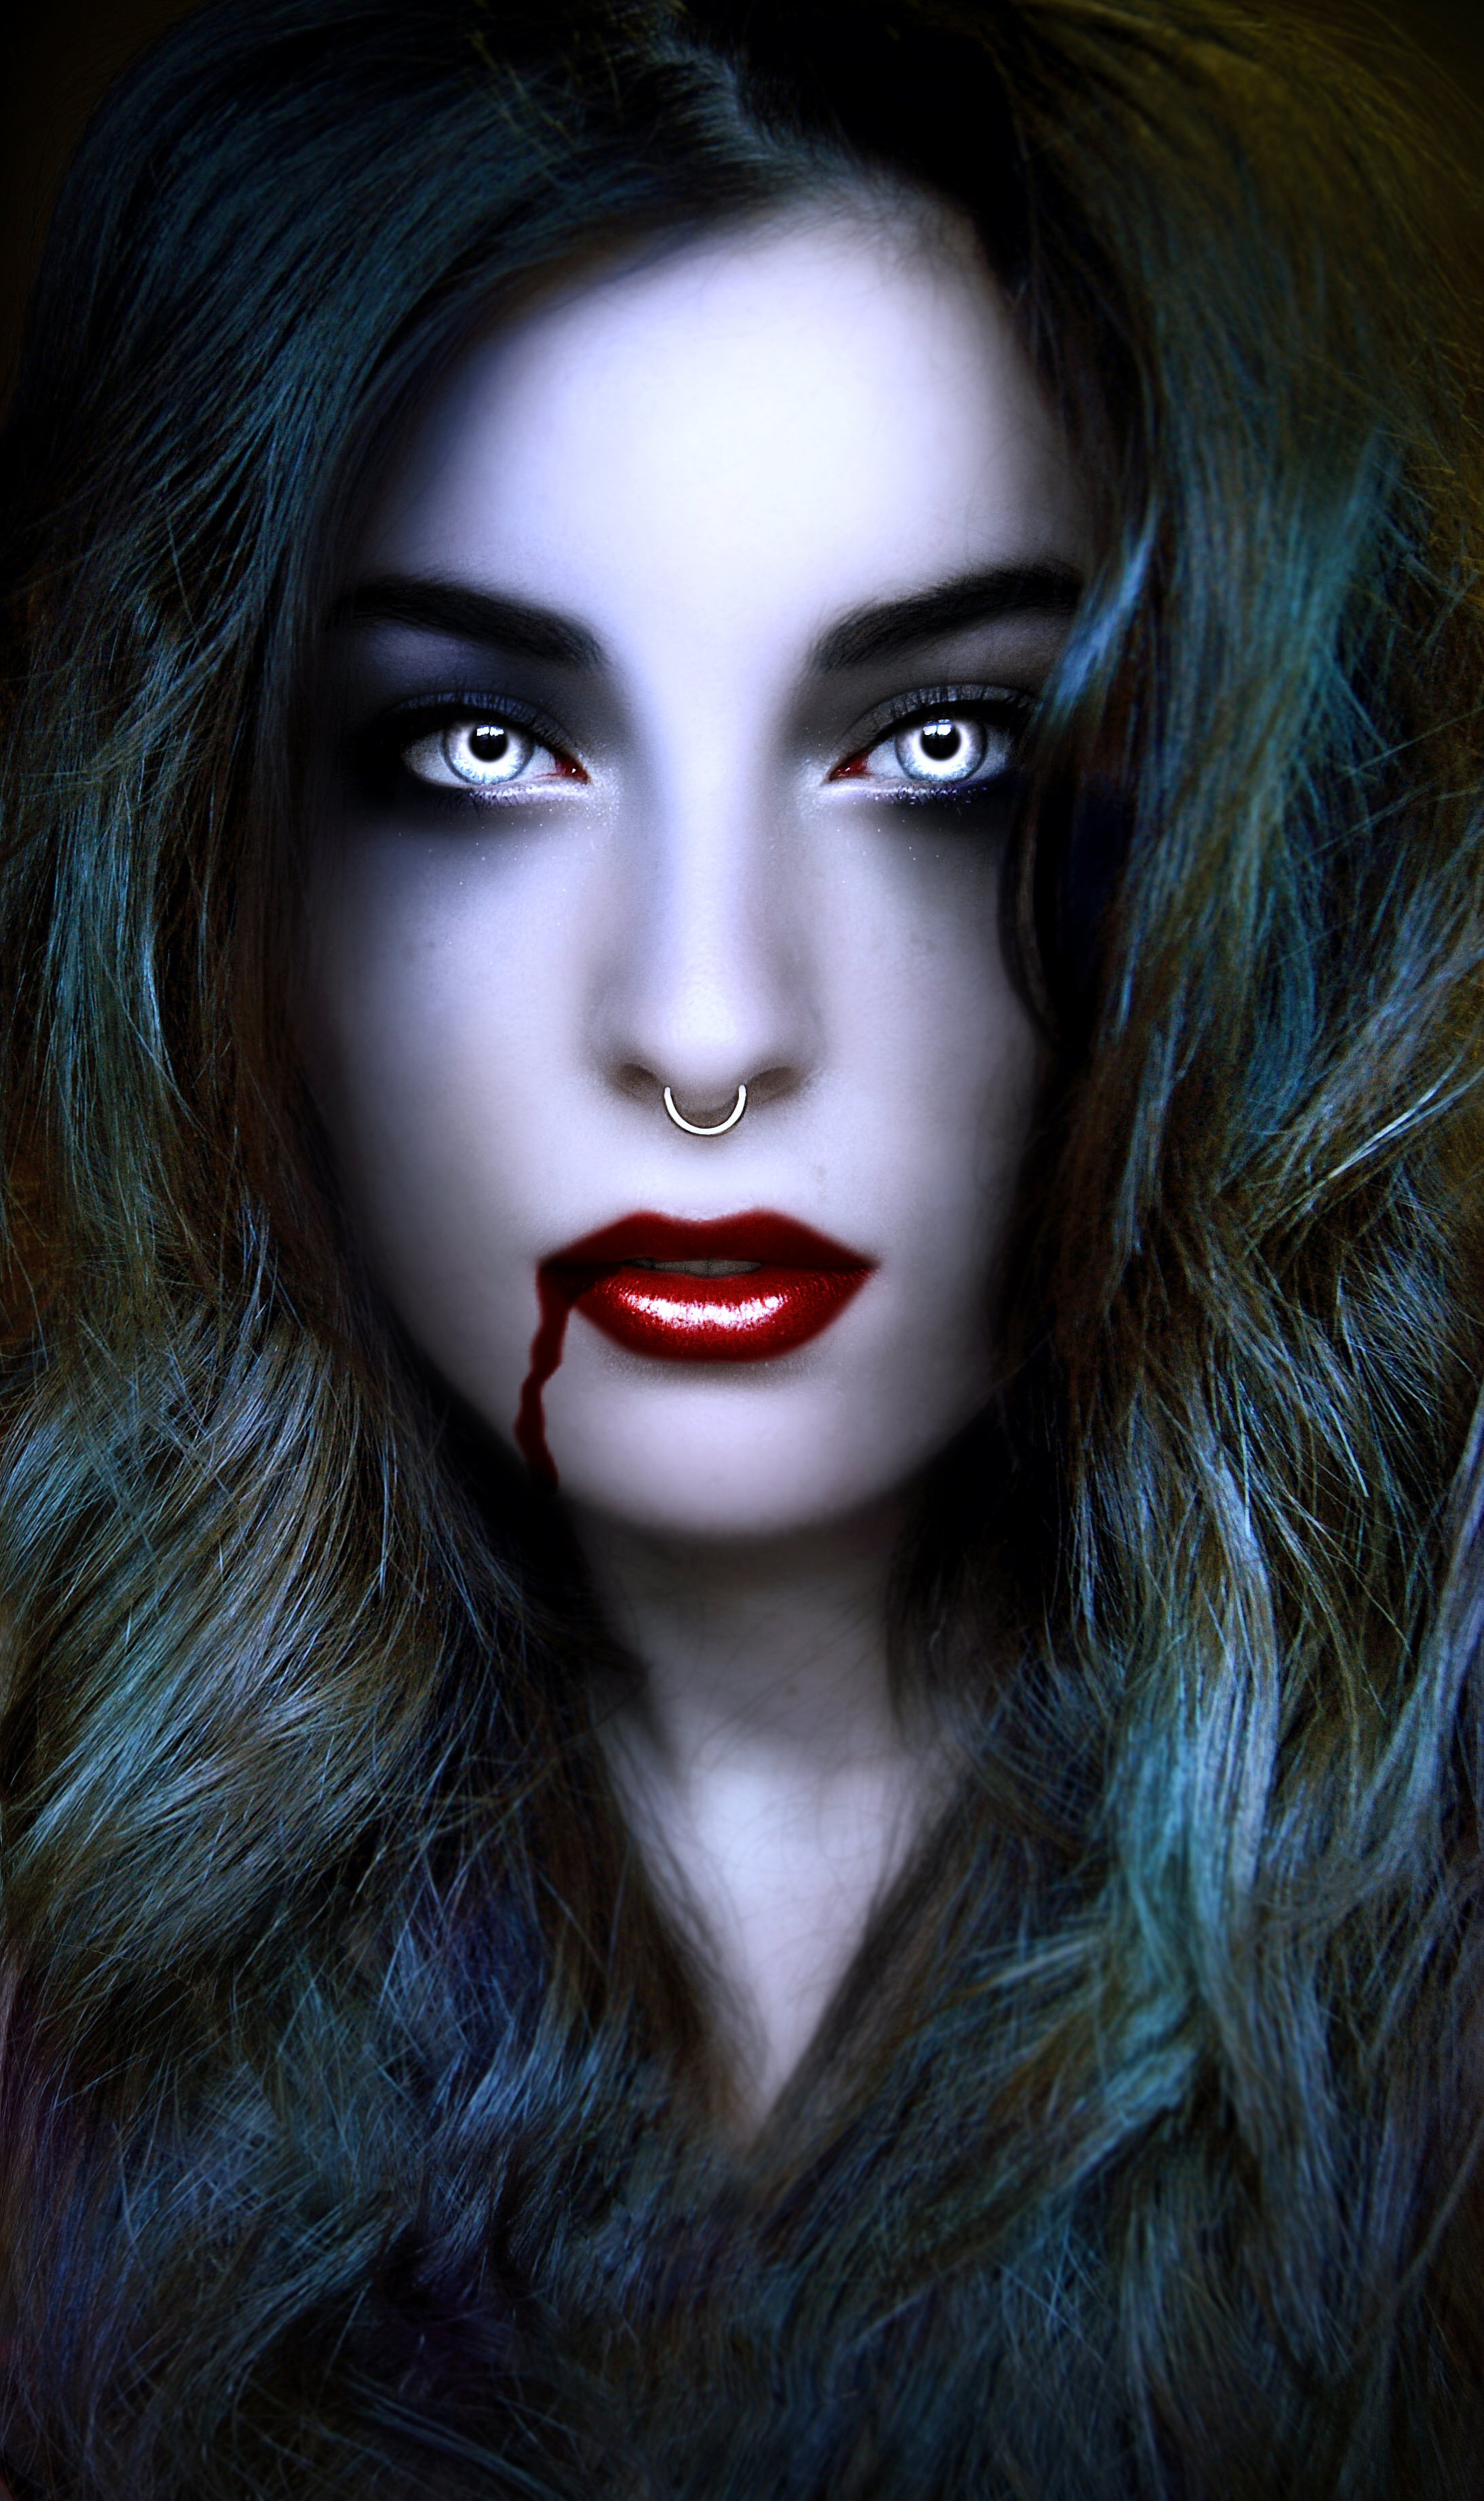 Heiße sexy Vampir Mädchen Comics